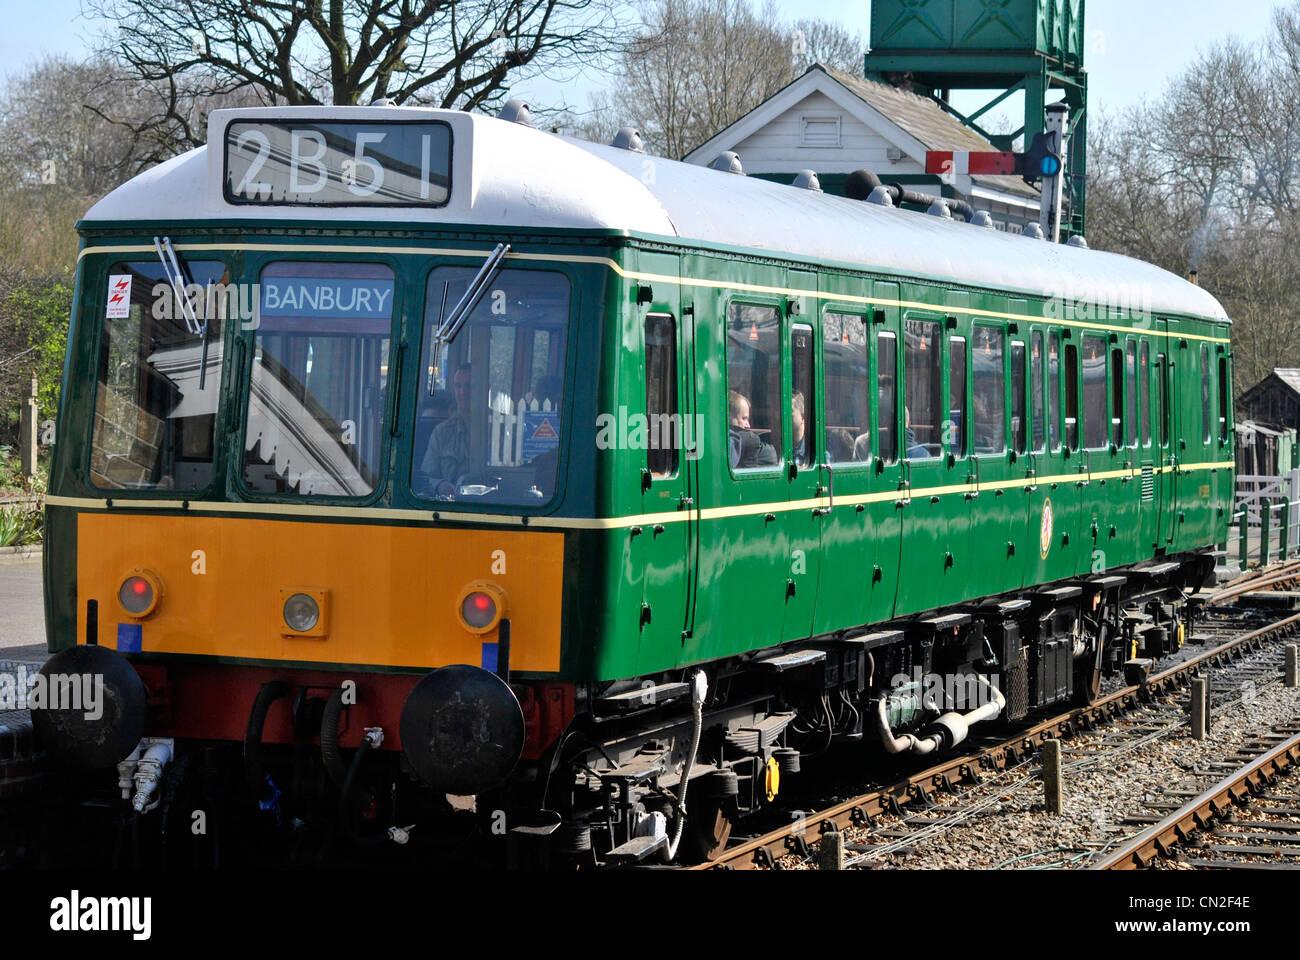 Train taken at Colne Valley Railway - Stock Image